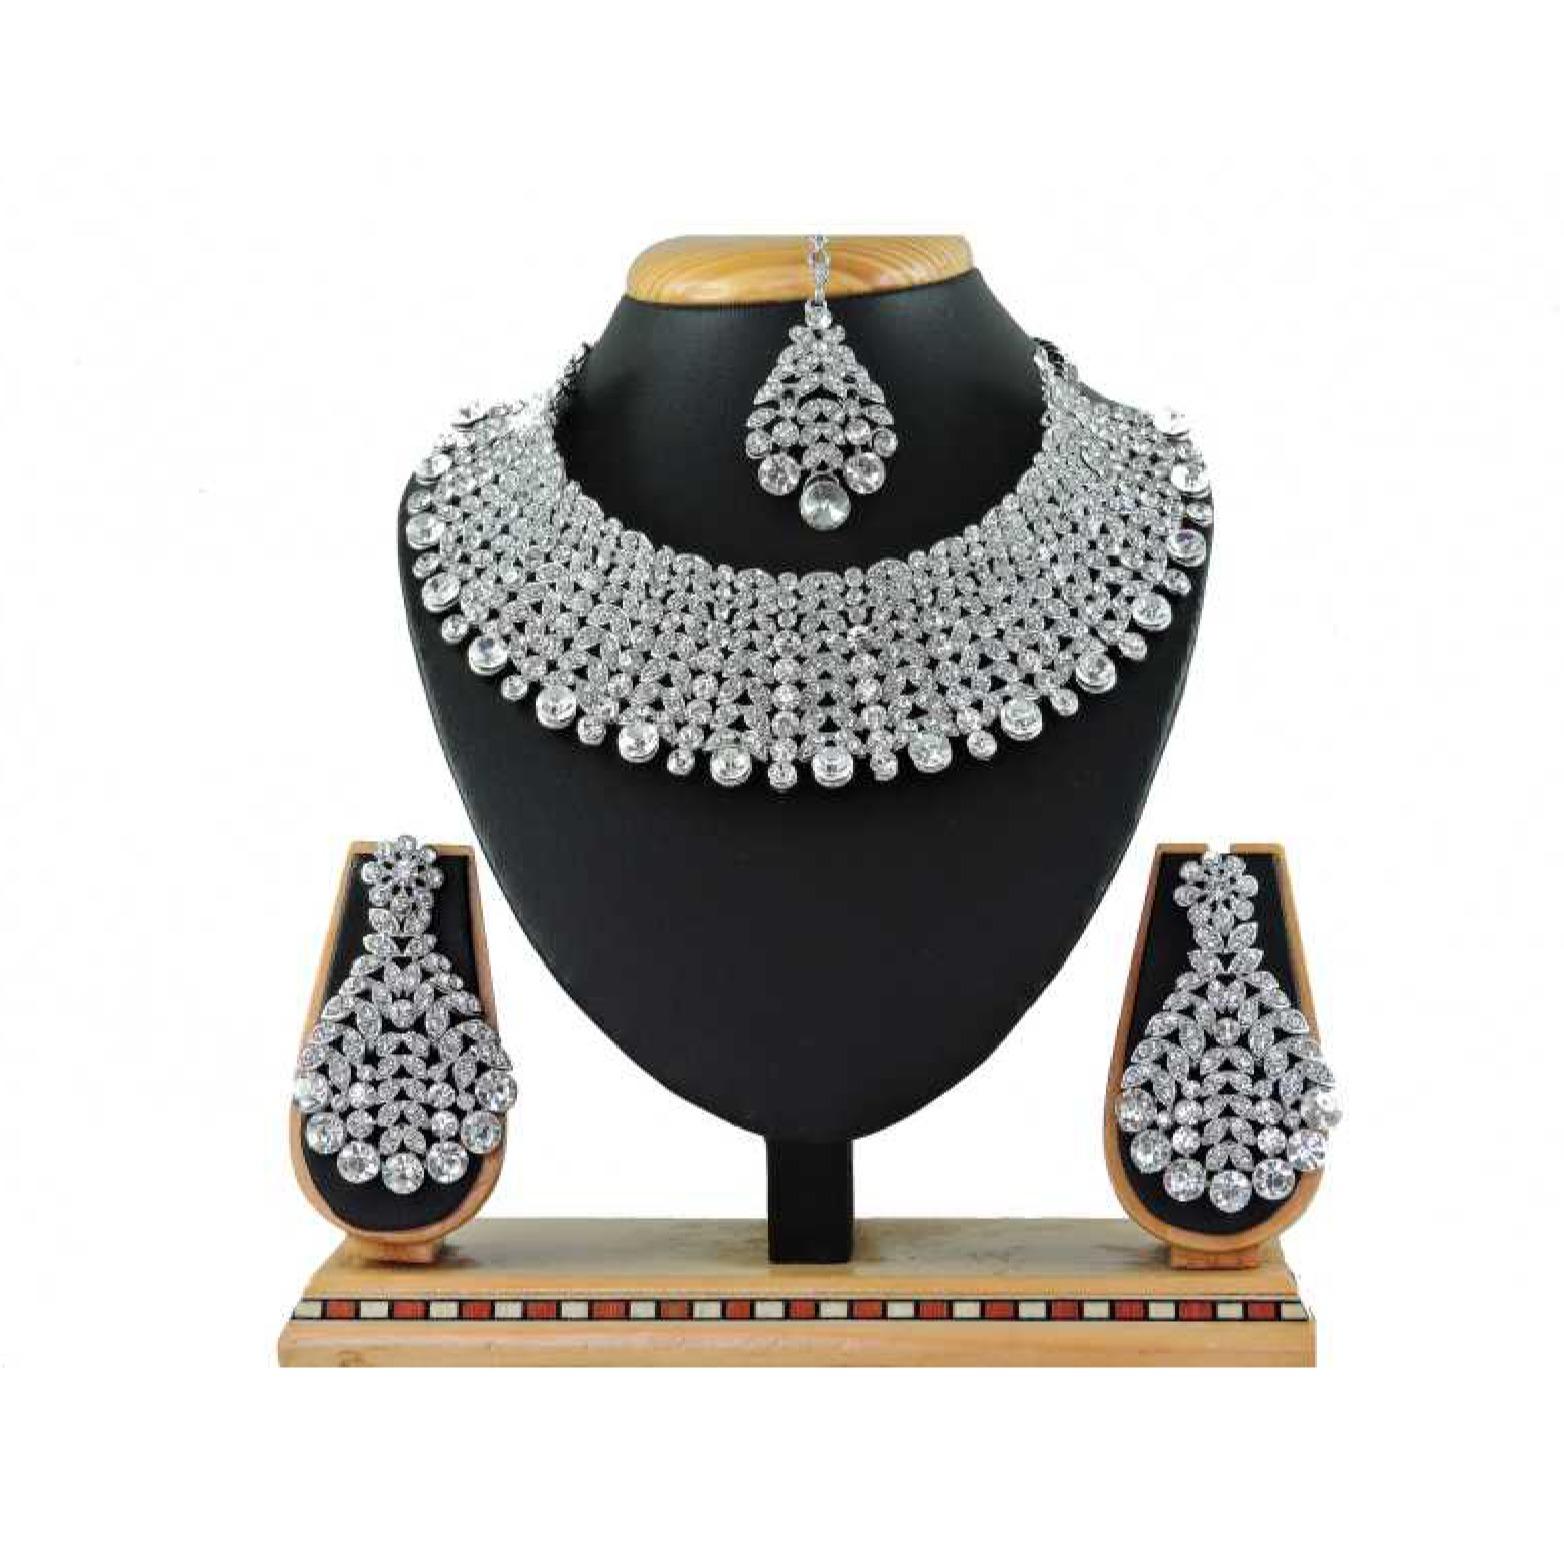 VATSALYA creation Alloy Jewel Set Price in India - Buy VATSALYA creation Alloy Jewel Set Online at Best Prices in India | Flipkart.com